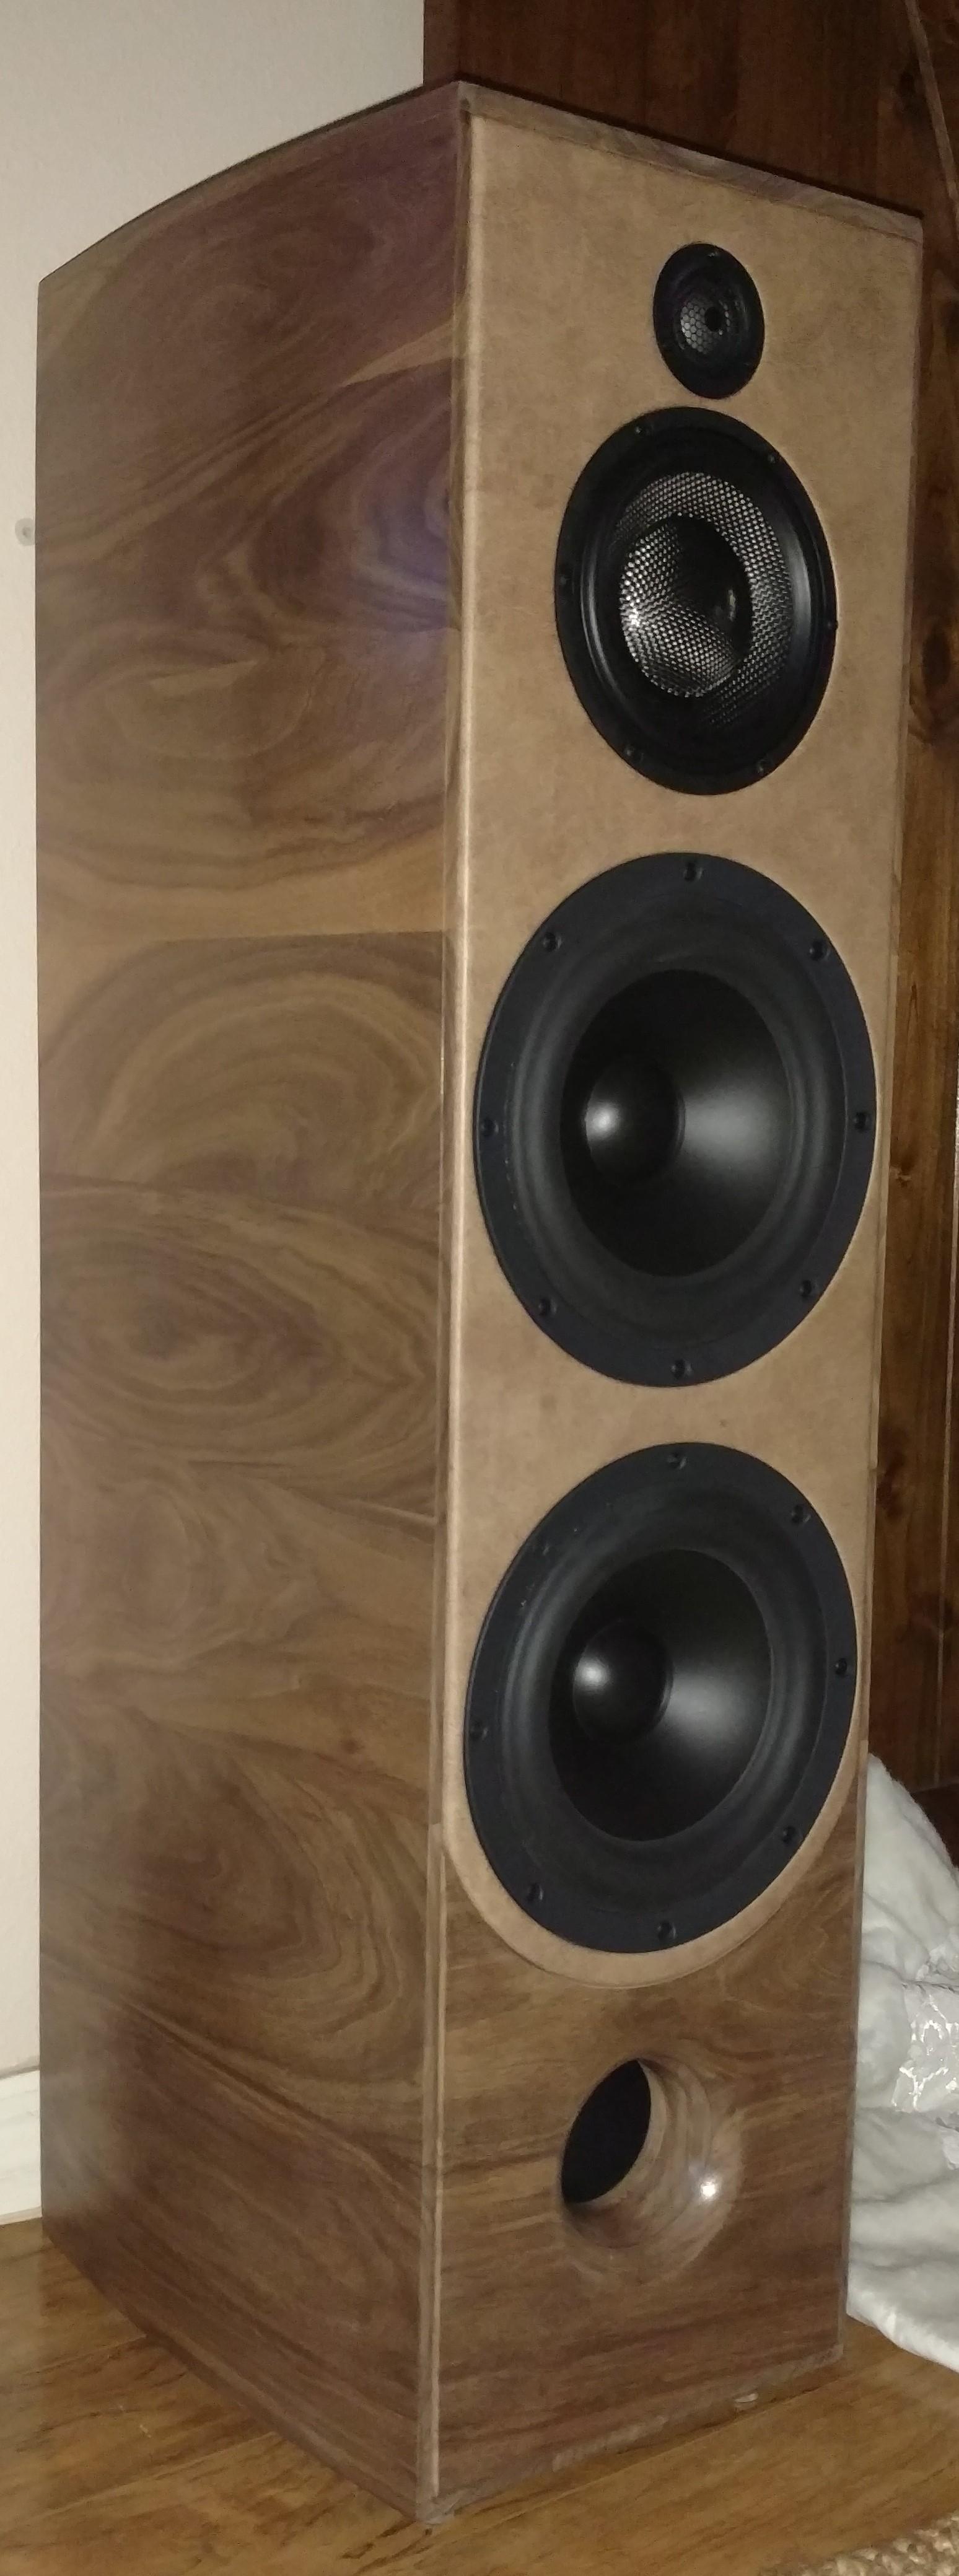 Coesivo speaker.jpg